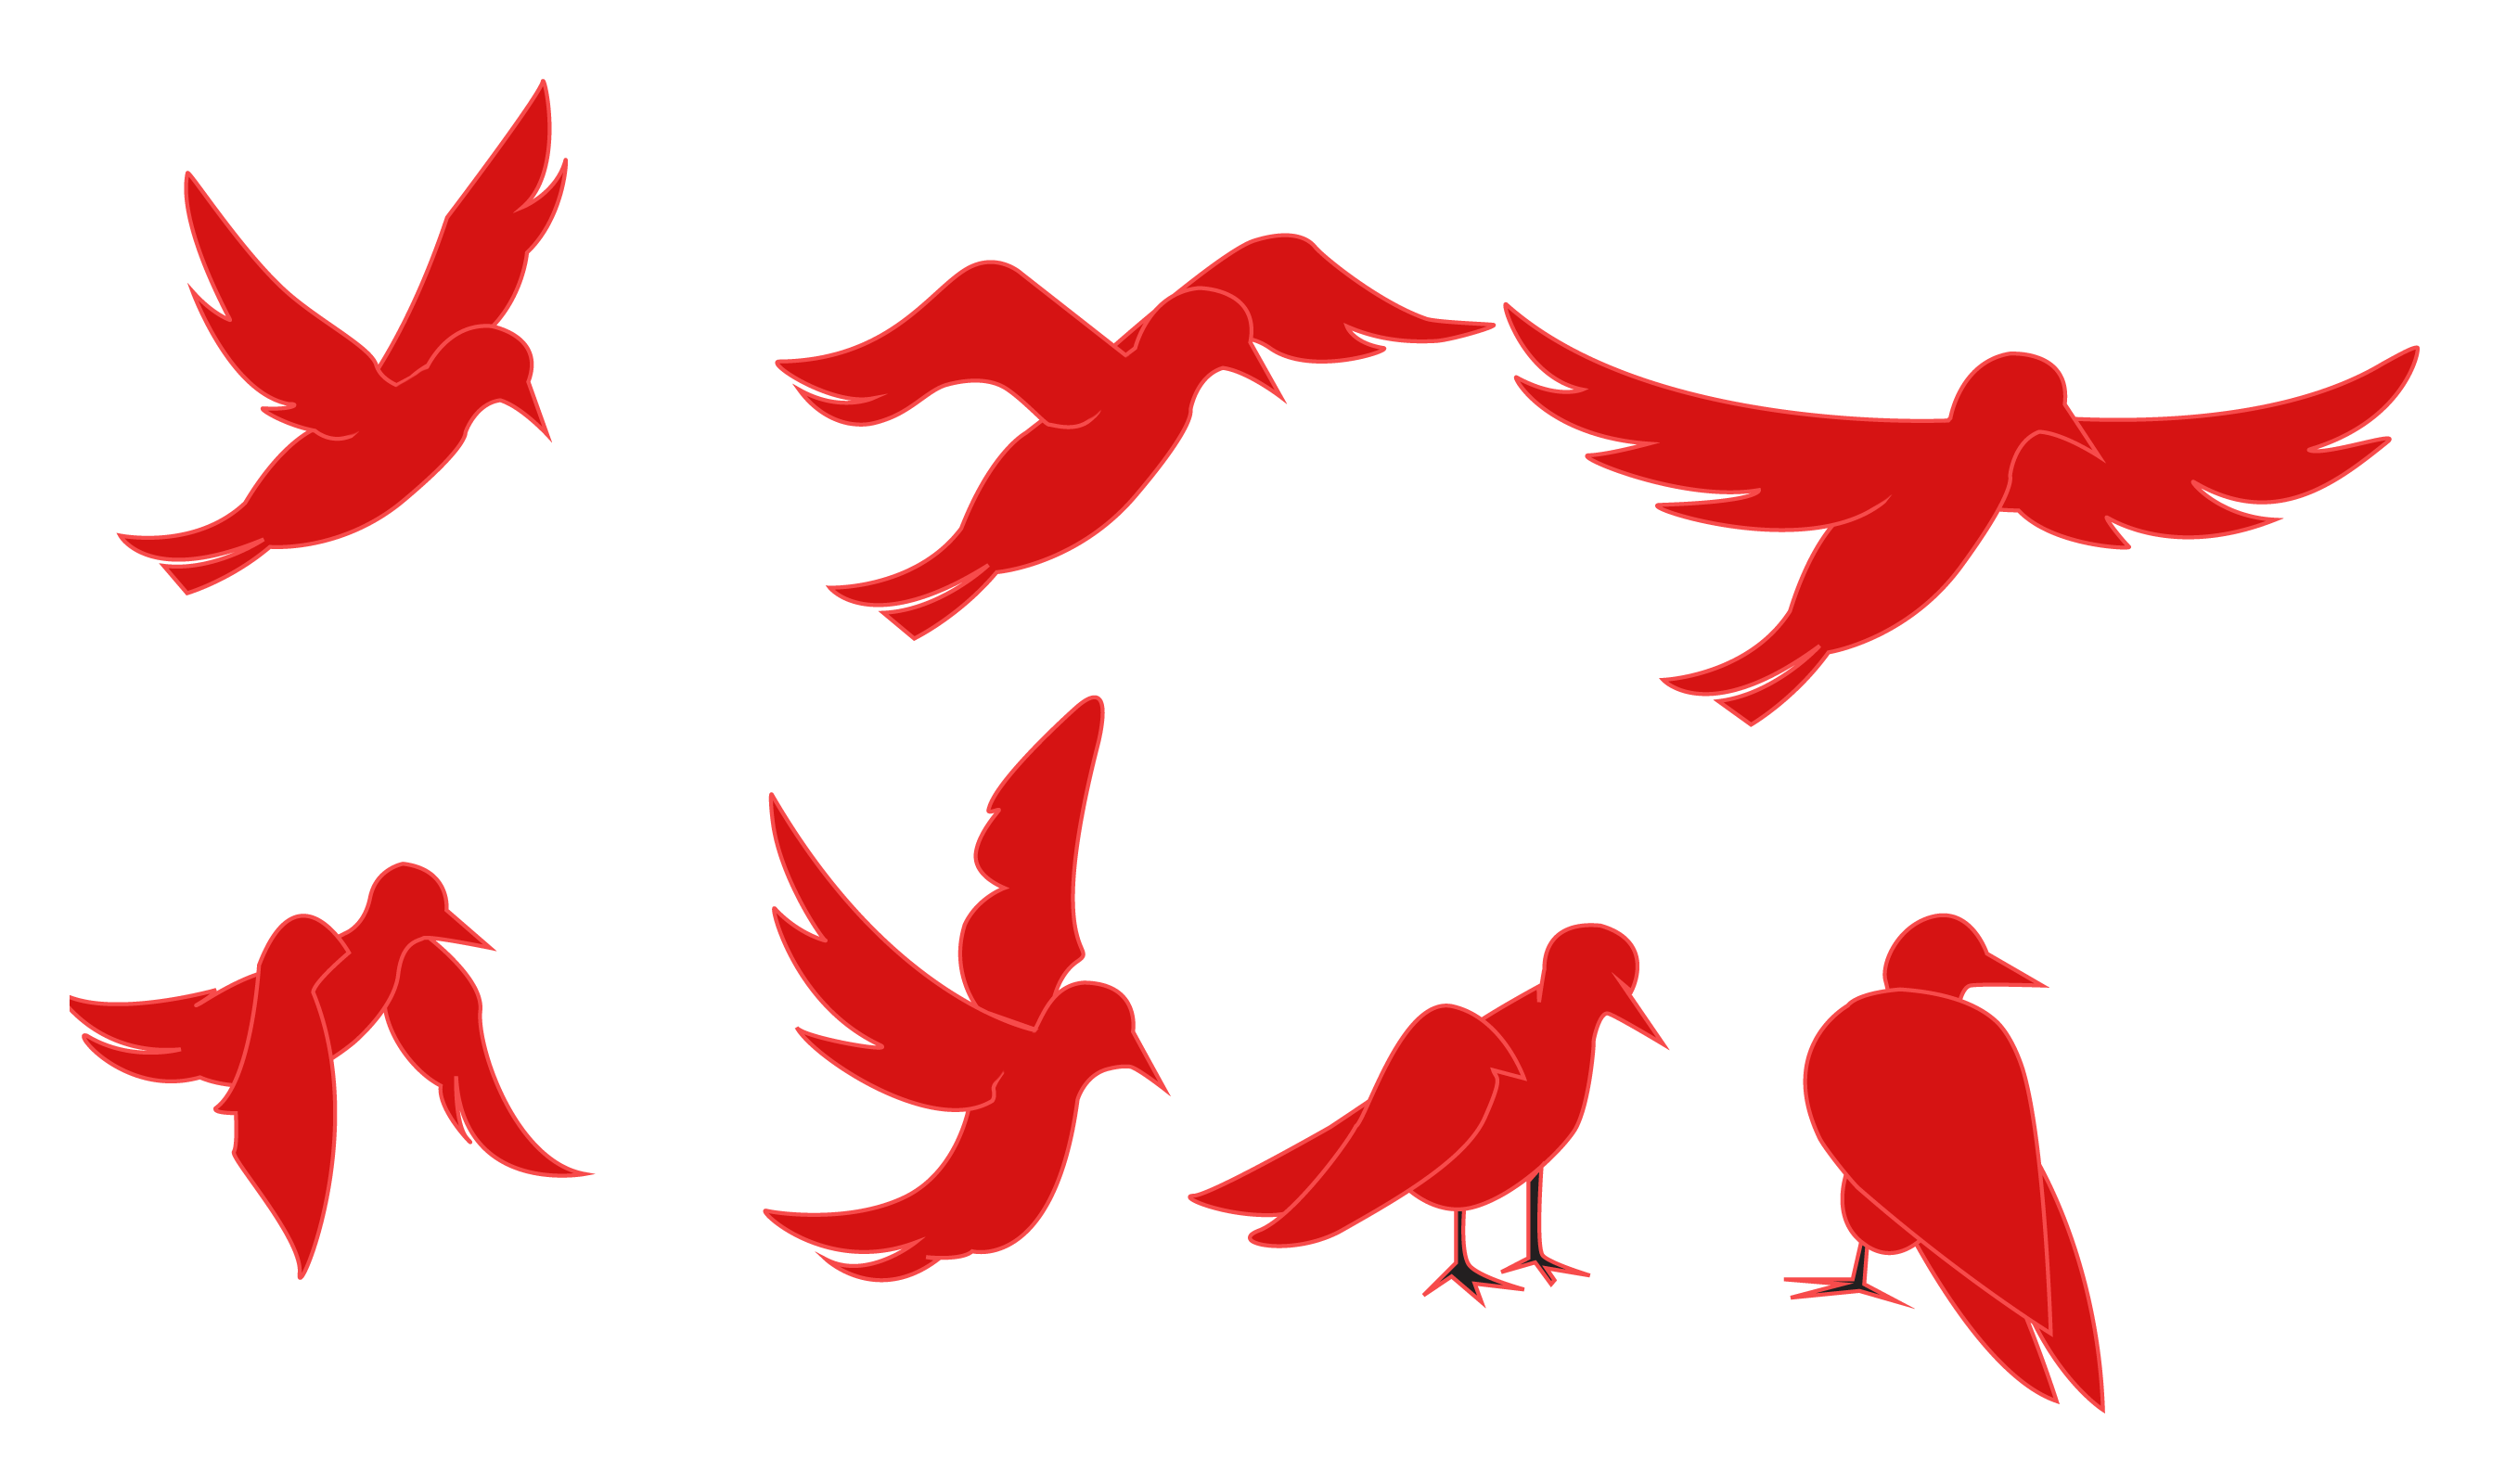 Adobe Edge Preview - Creating an Animated Bird